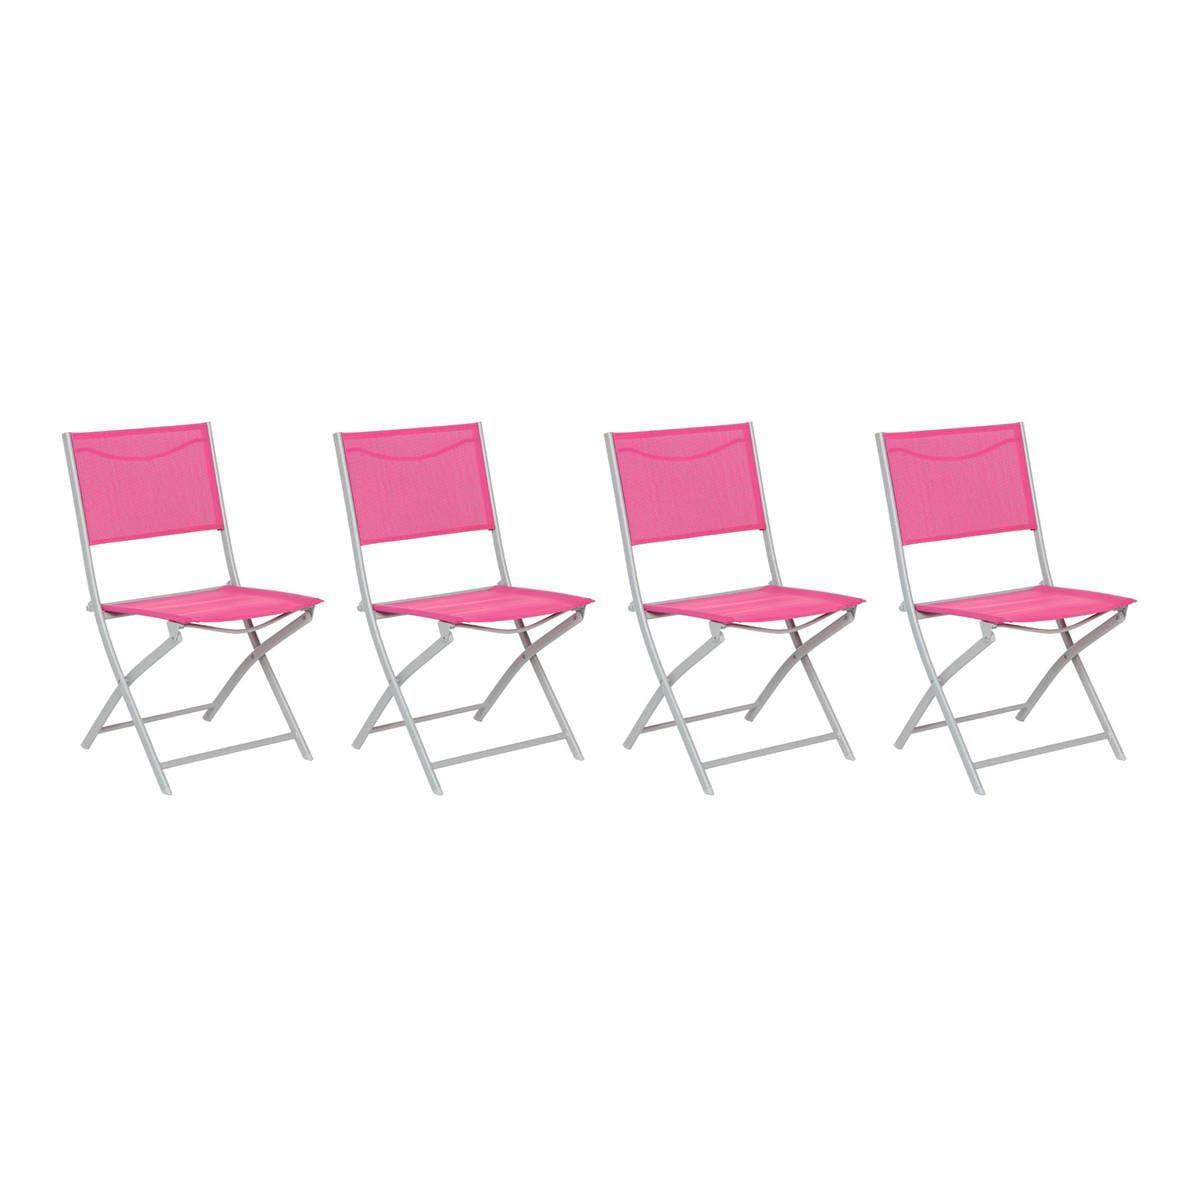 Chaise Pliante Modula Hesperide Framboise/graphite Chaises ... pour Chaise De Jardin Hesperide